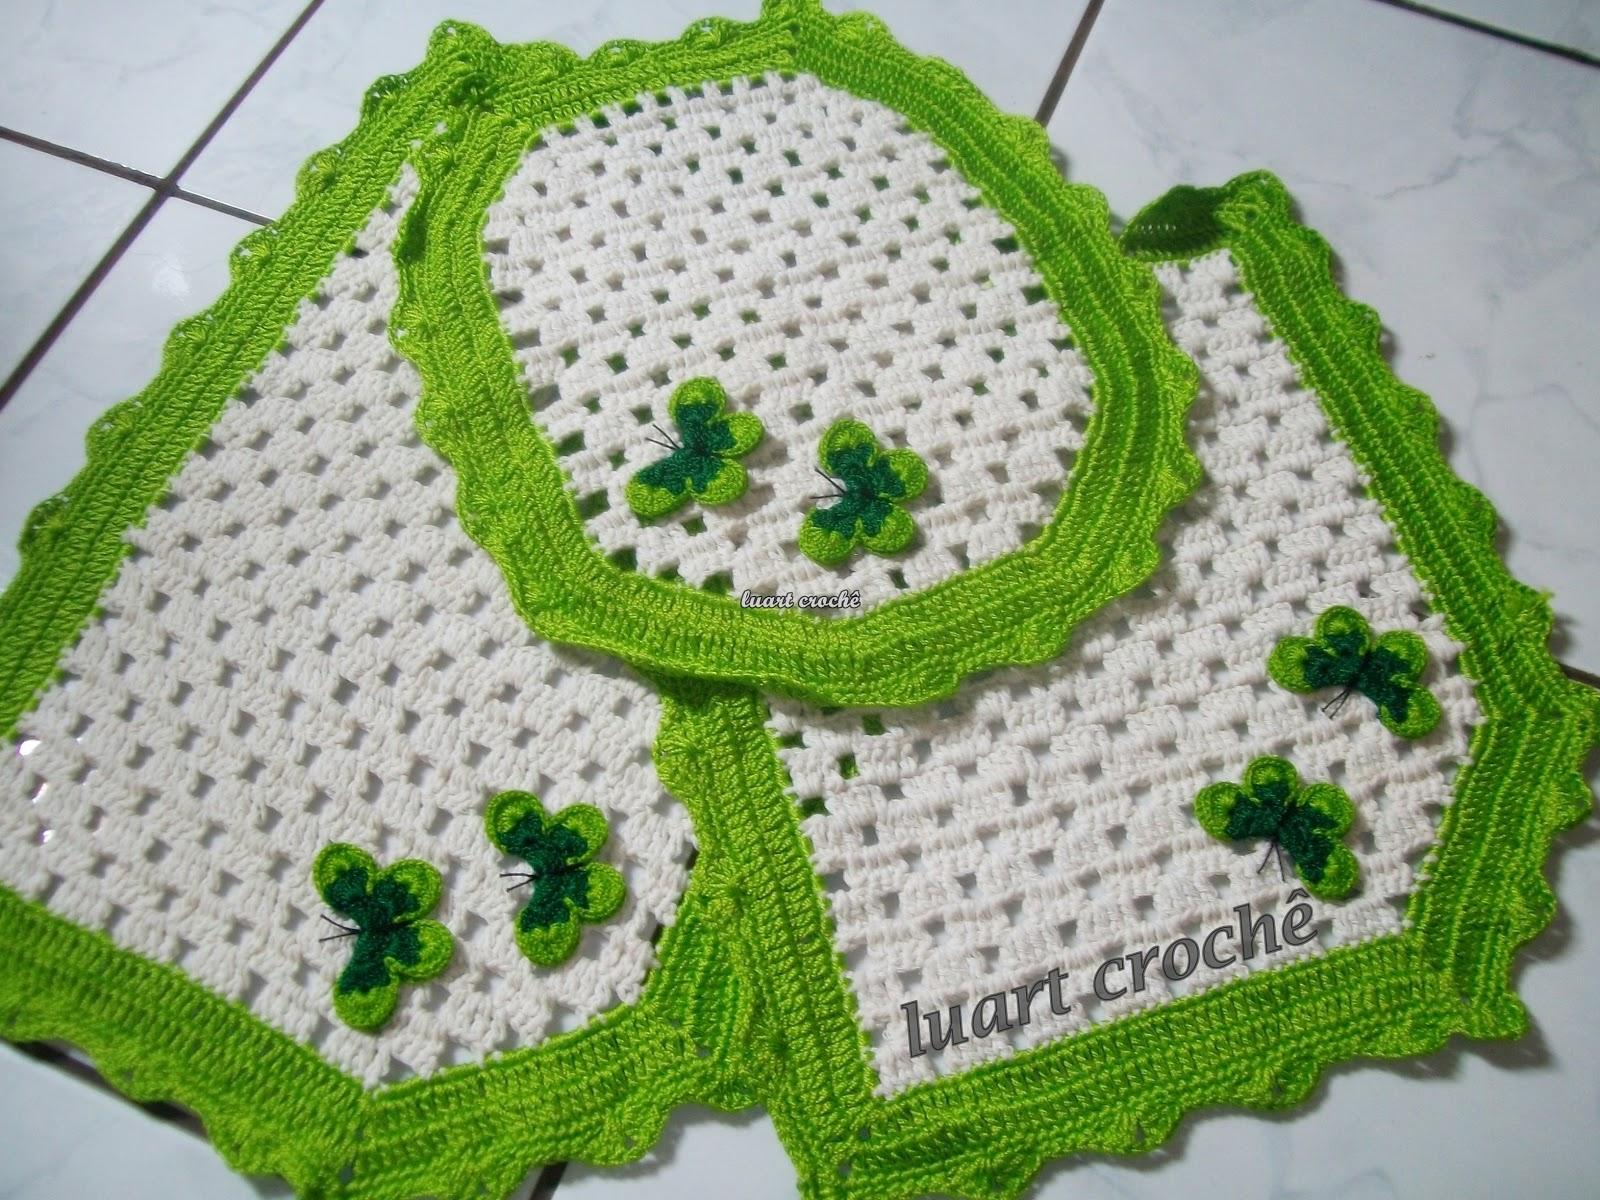 Luart Crochê #417410 1600x1200 Banheiro Bonito Simples